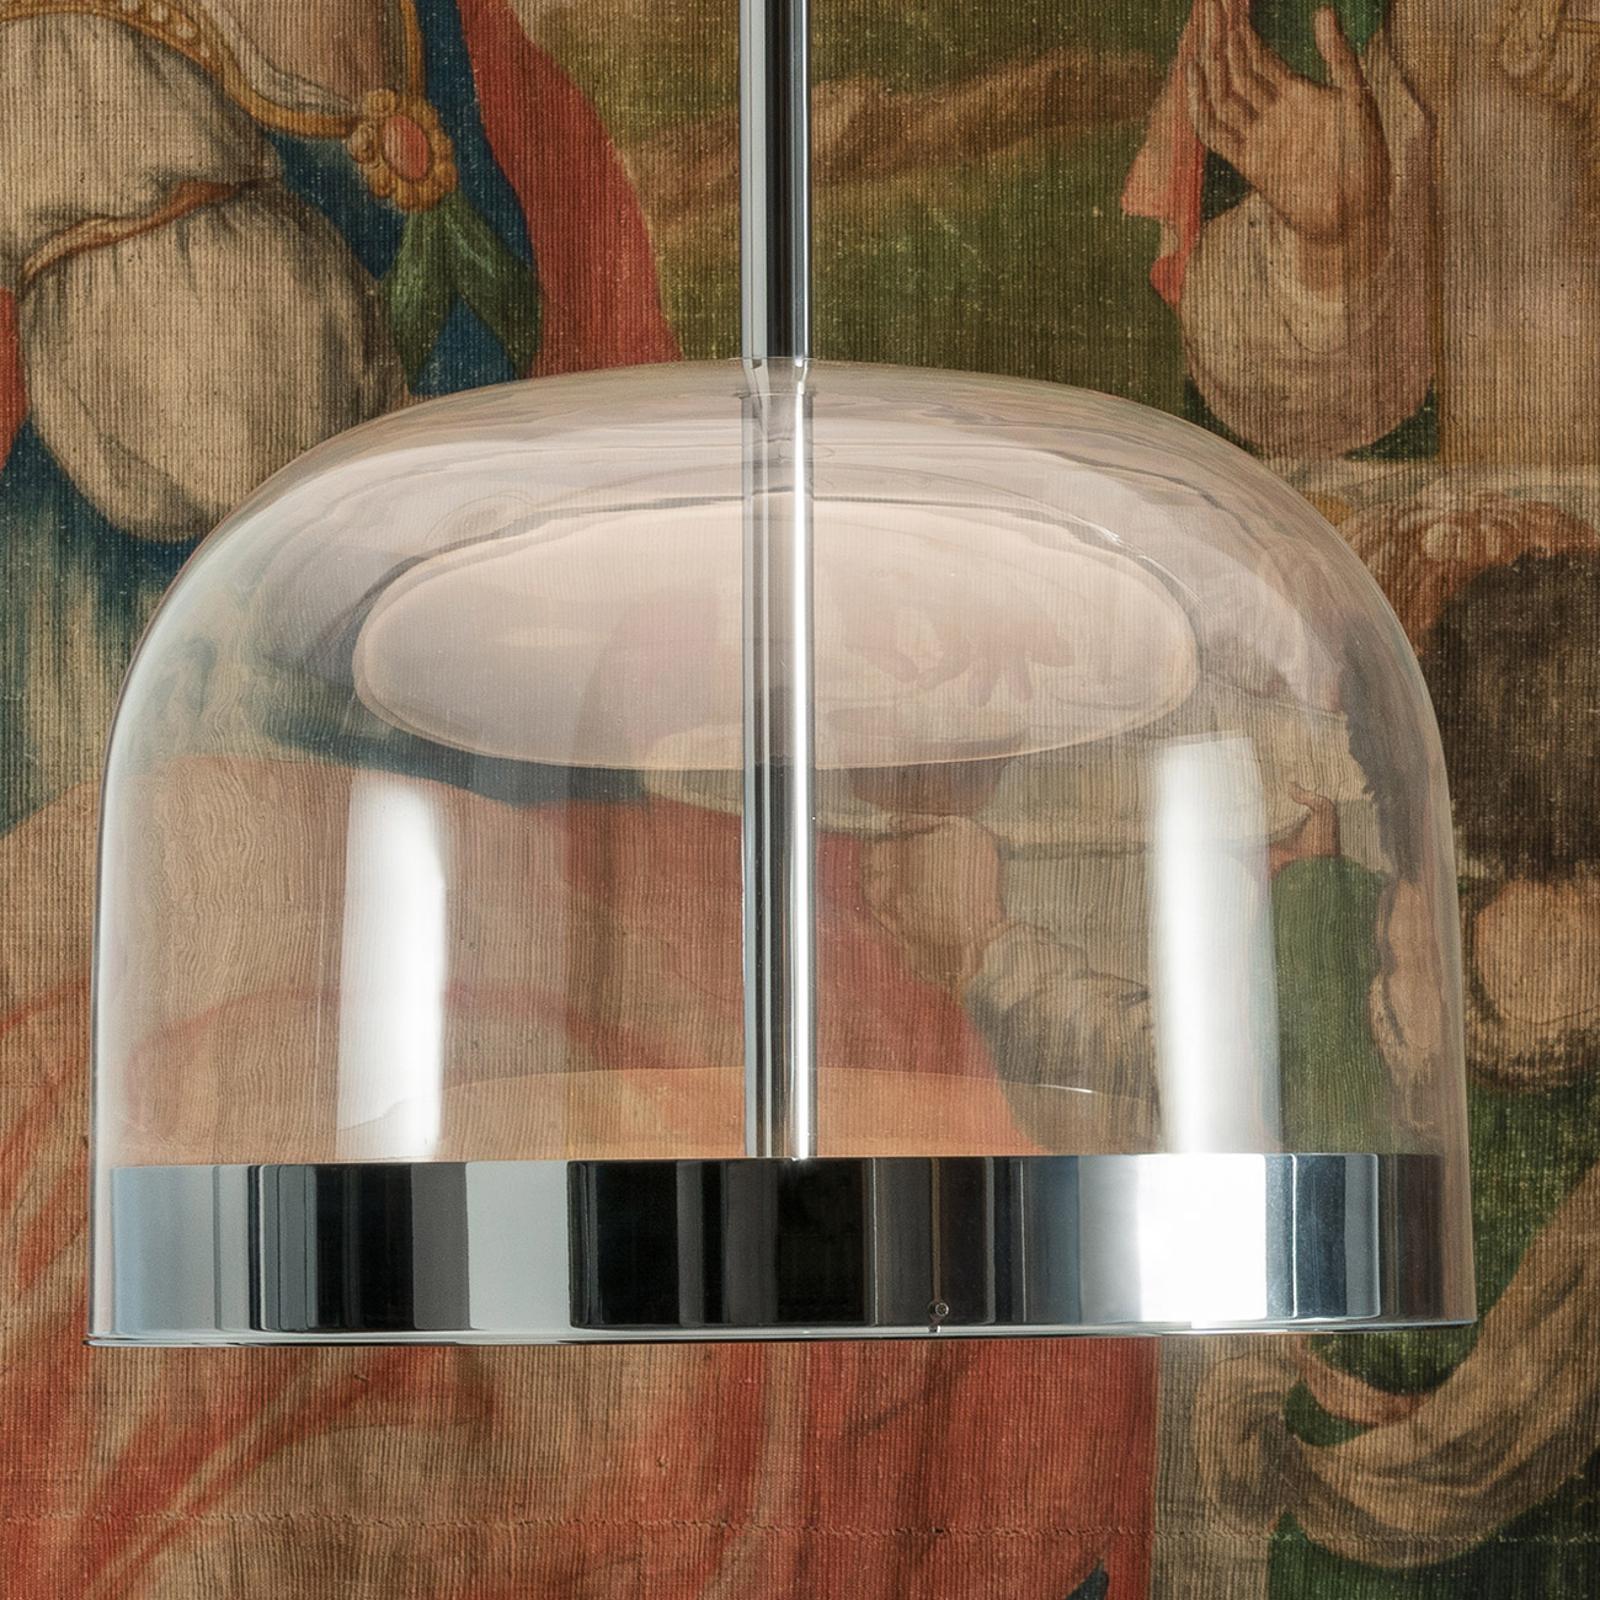 Miedziana lampa wisząca LED Equatore, 23,8 cm